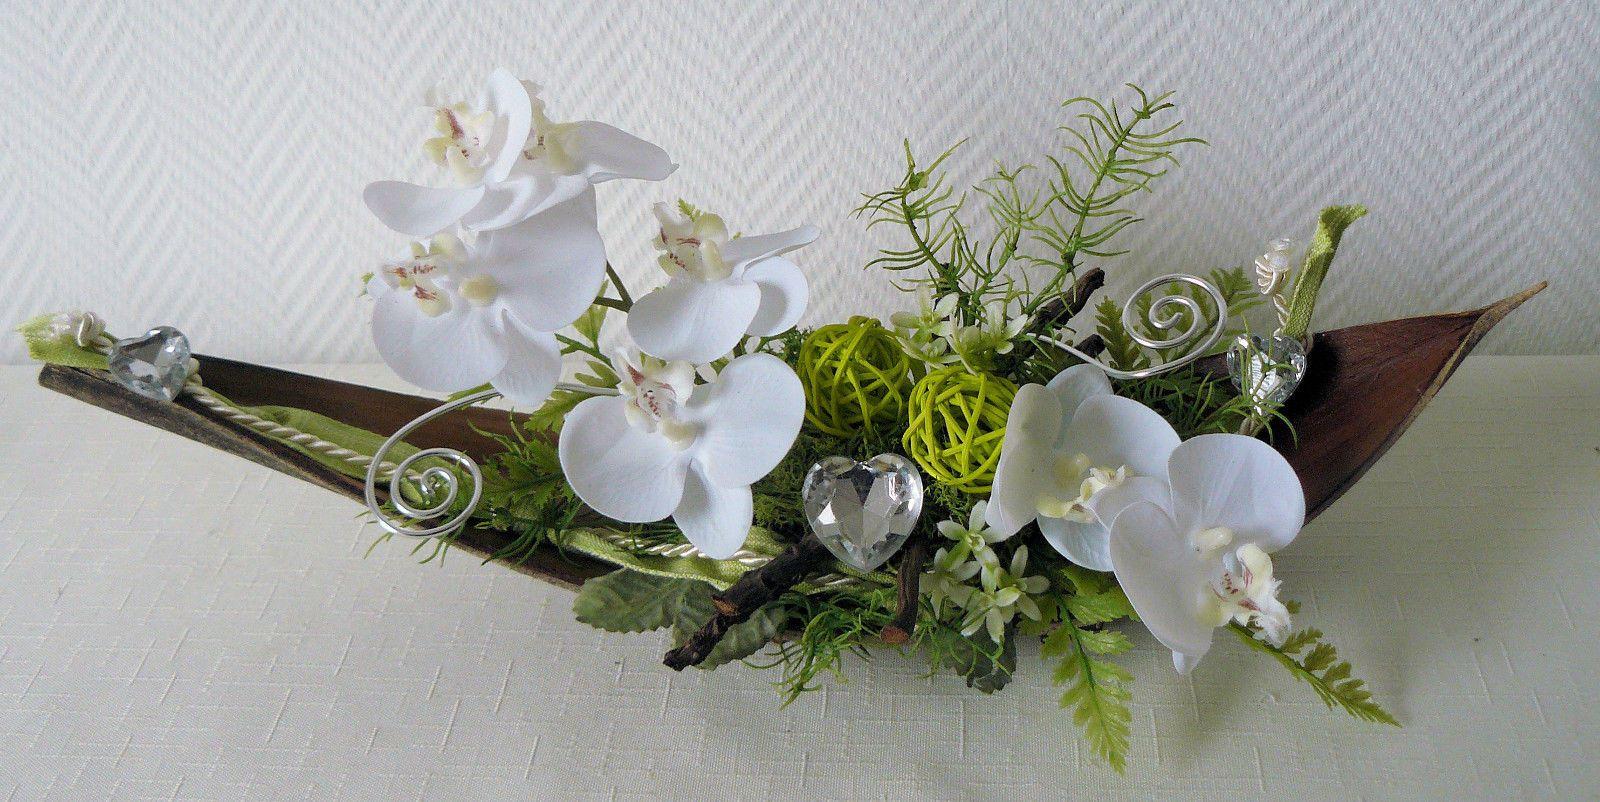 Tischdekoration Tischgesteck Gesteck Orchidee Weiss Grun Kokosblatt